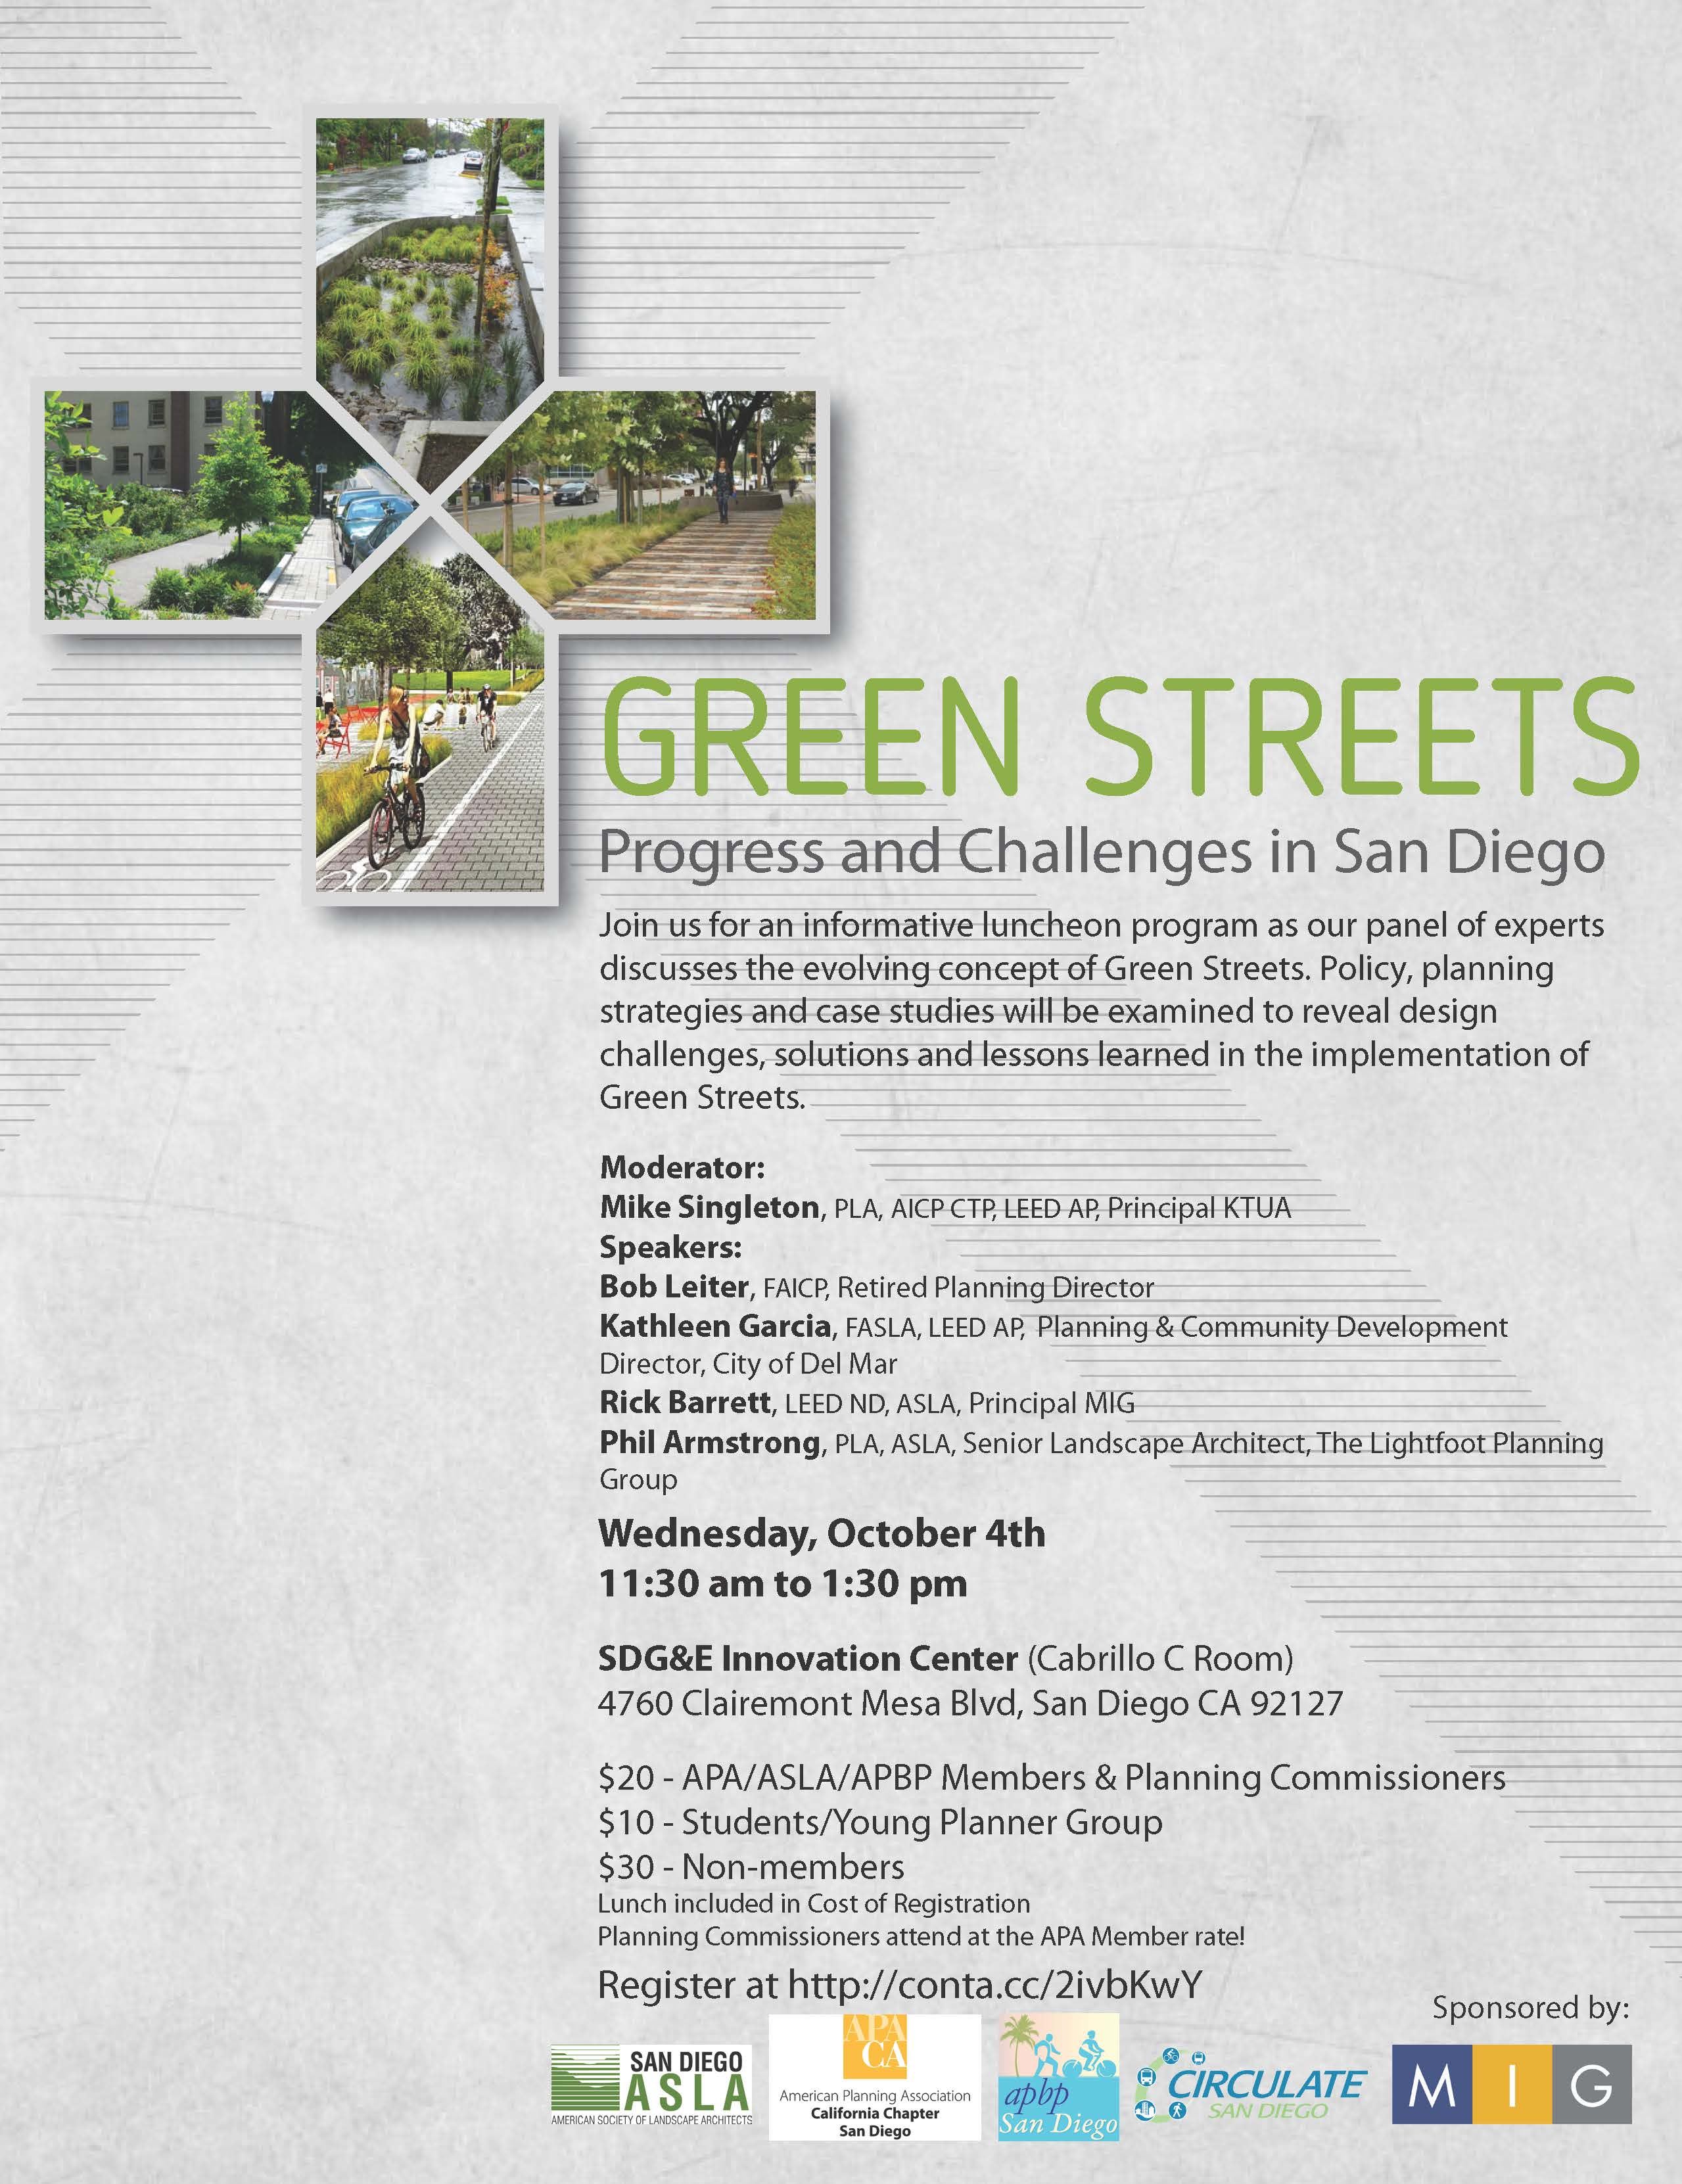 Green_Streets_Event_Flyer_v6.jpg